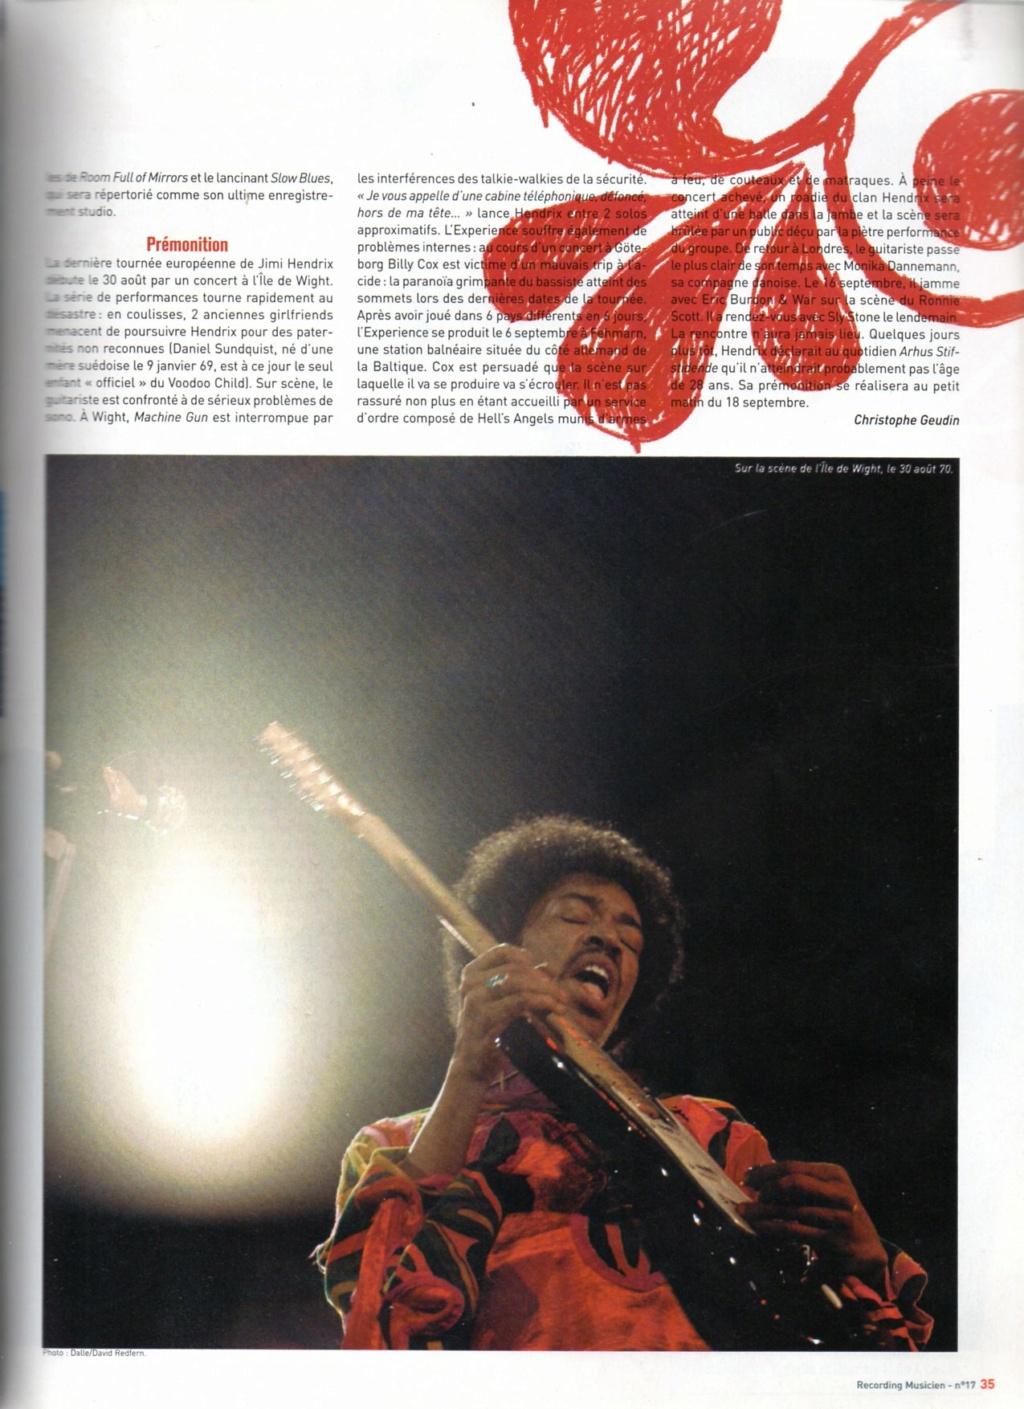 Magazines Français 1989 - 2014 - Page 2 Record13